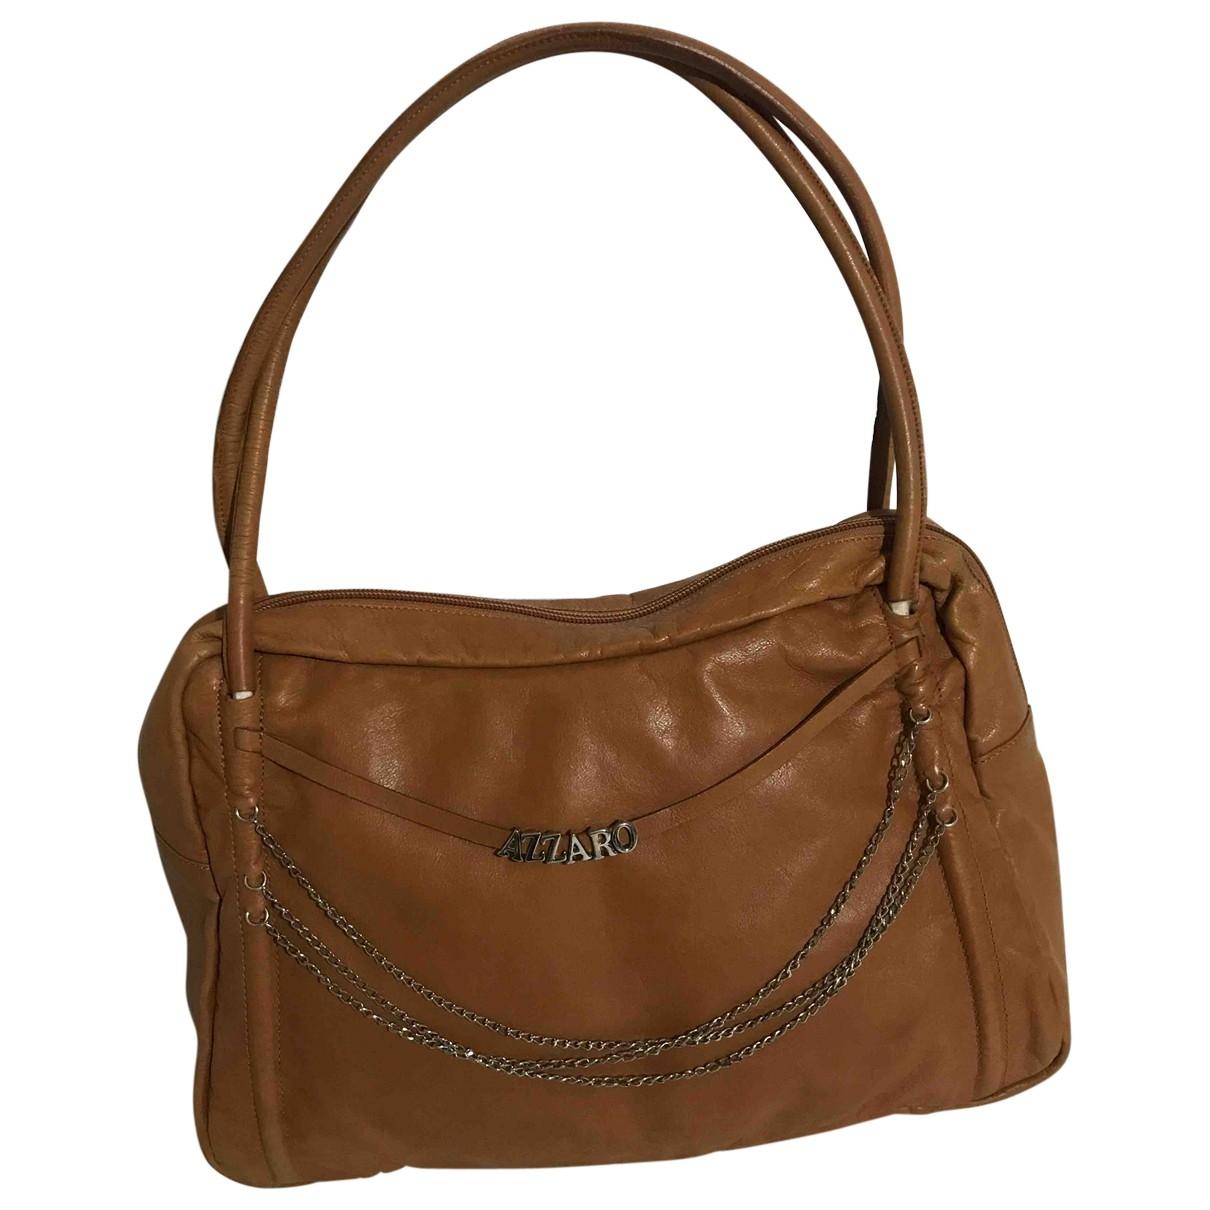 Azzaro \N Handtasche in  Kamel Leder